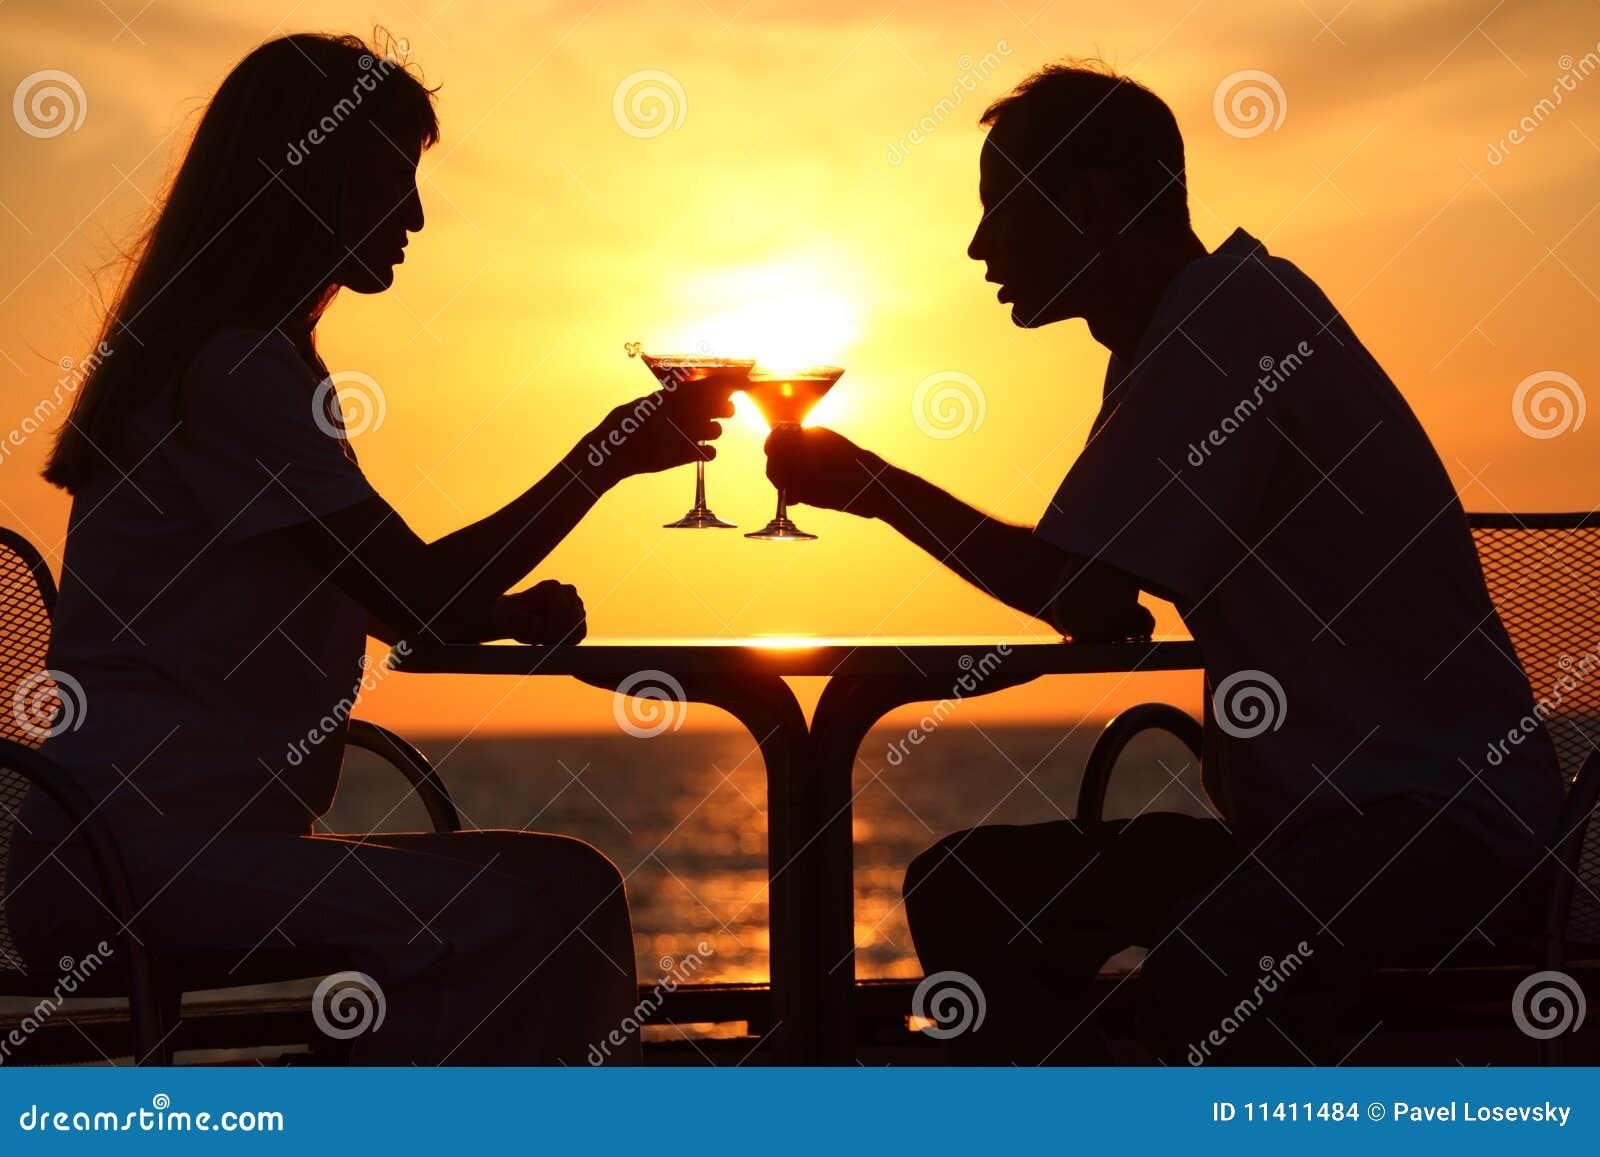 couple clink glasses on sunset outside stock images image 11411484. Black Bedroom Furniture Sets. Home Design Ideas